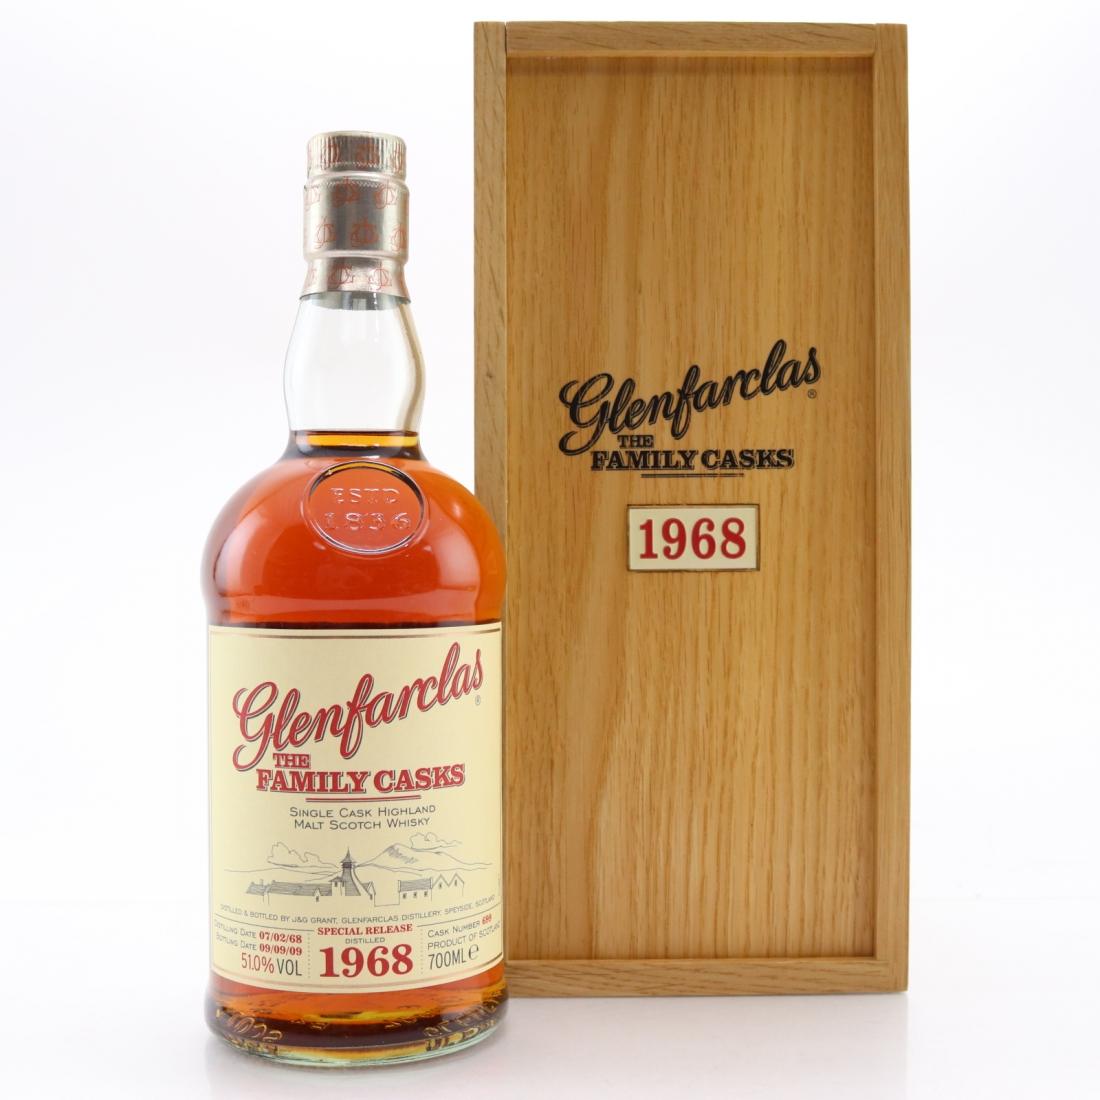 Glenfarclas 1968 Family Cask #699 / 1st Anniversary of Whiskysamples.eu